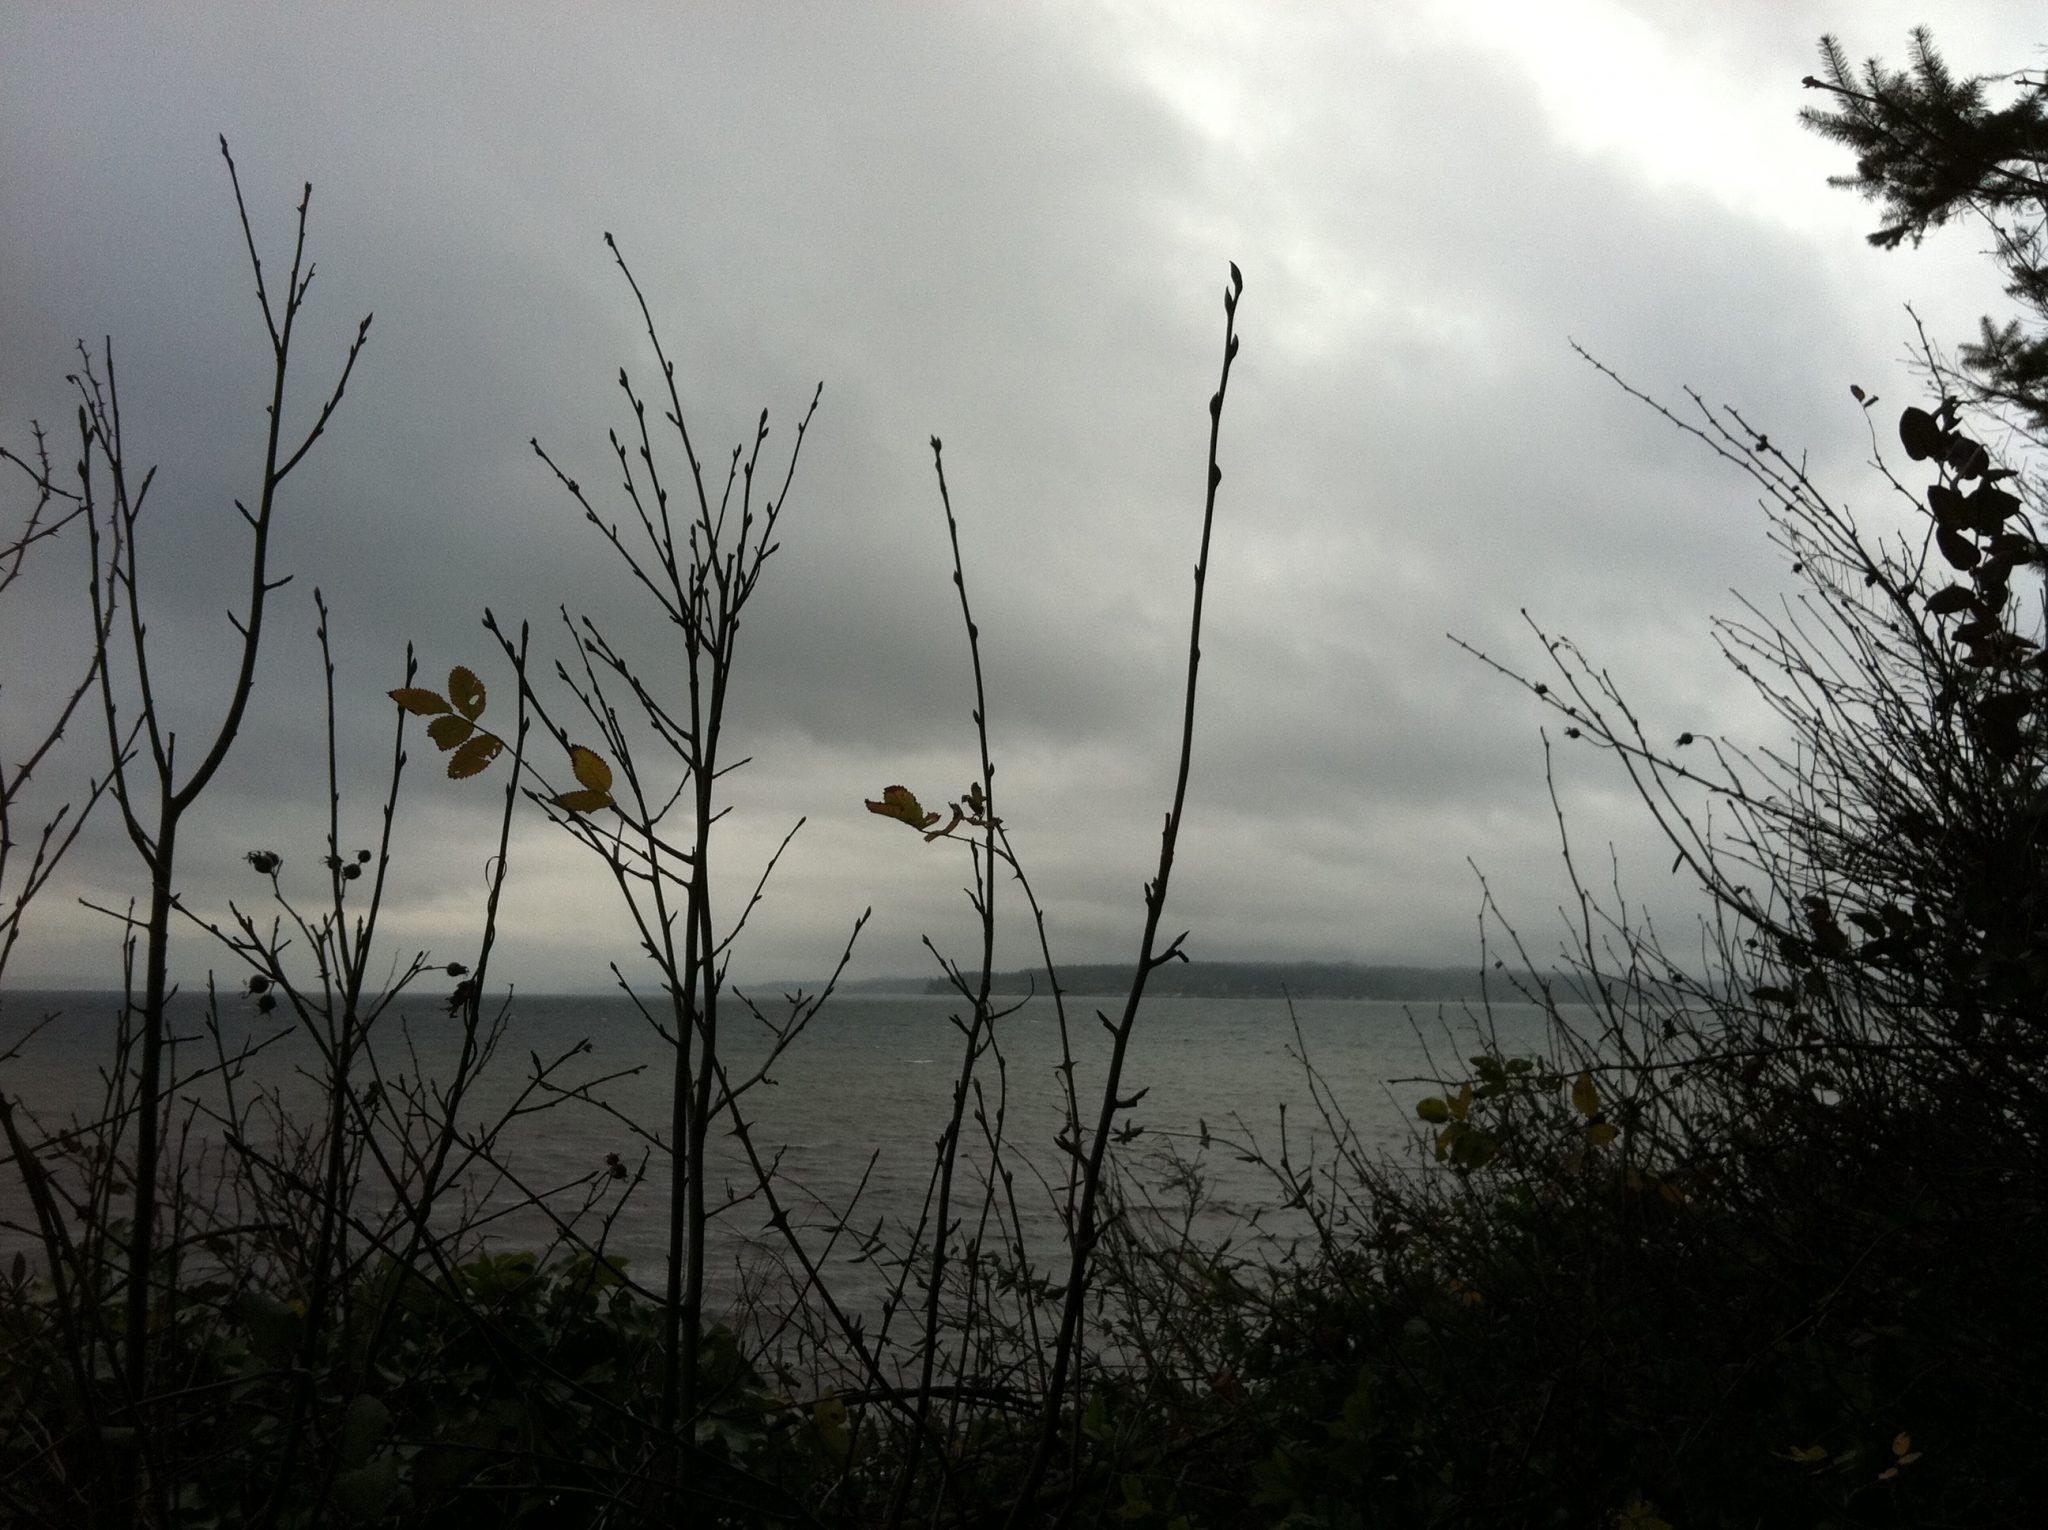 dark sky and twigs